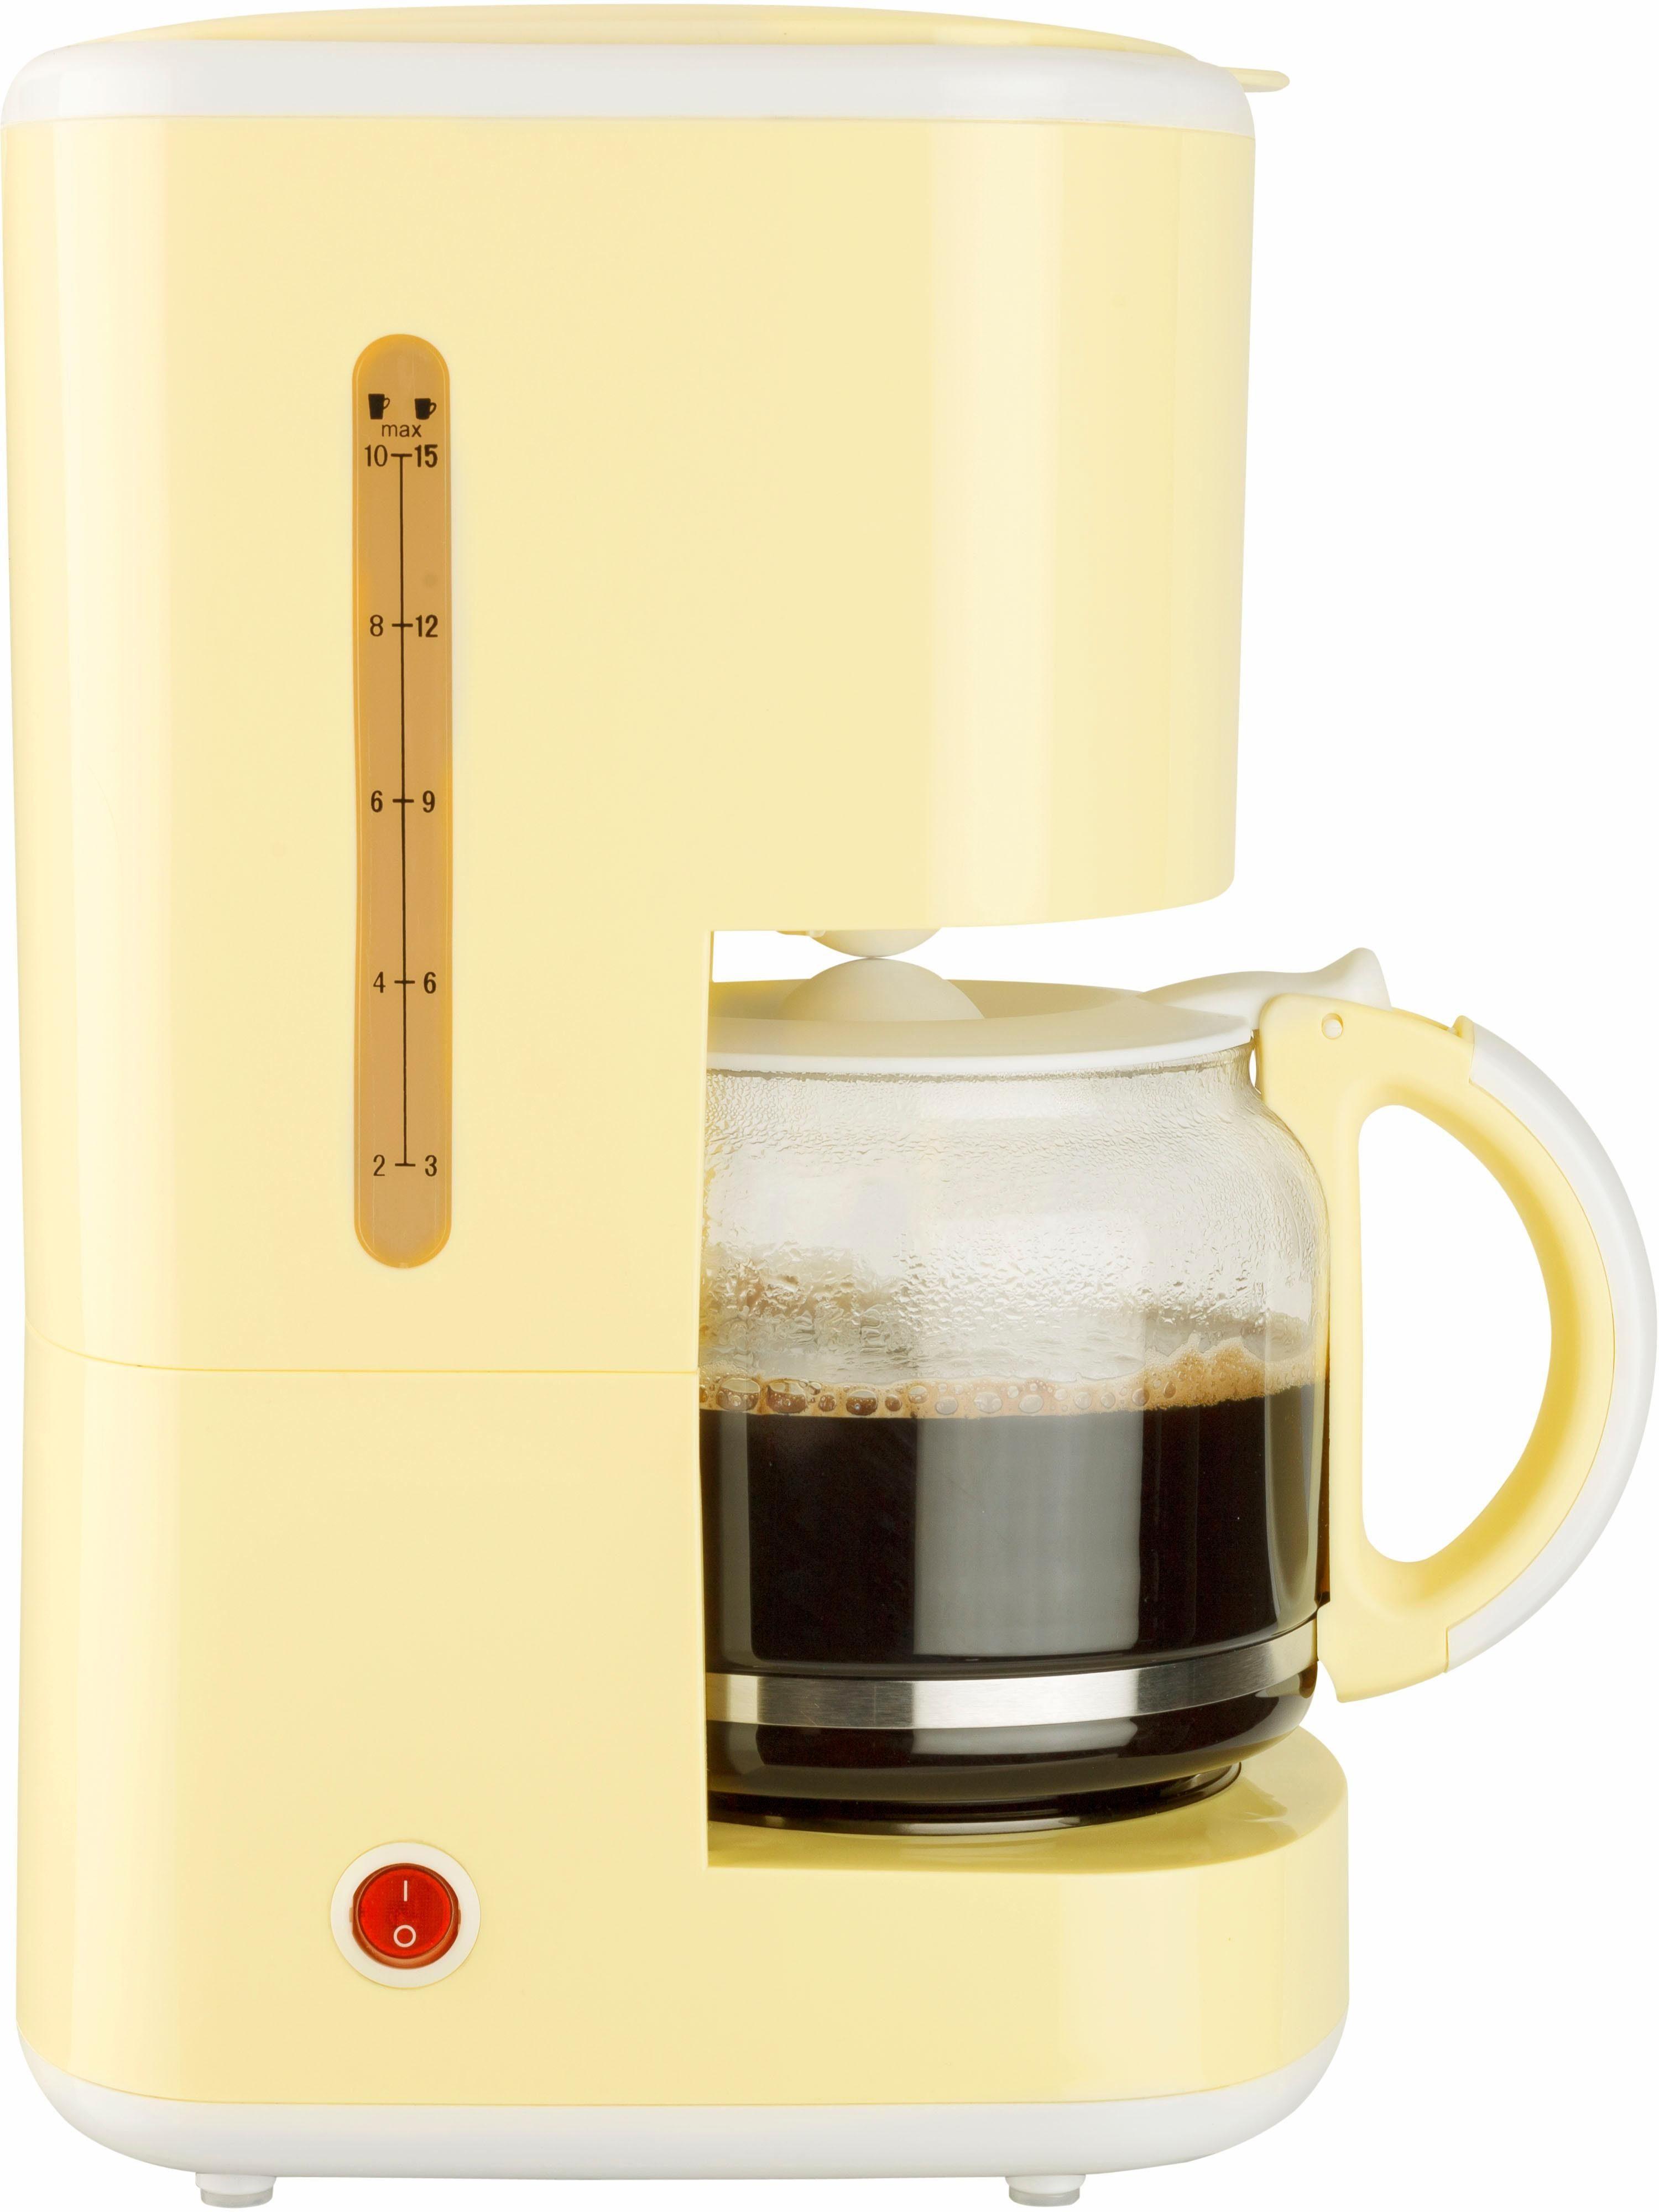 bestron Filterkaffeemaschine ACM300EVV, 1,5l Kaffeekanne, Permanentfilter 1x4